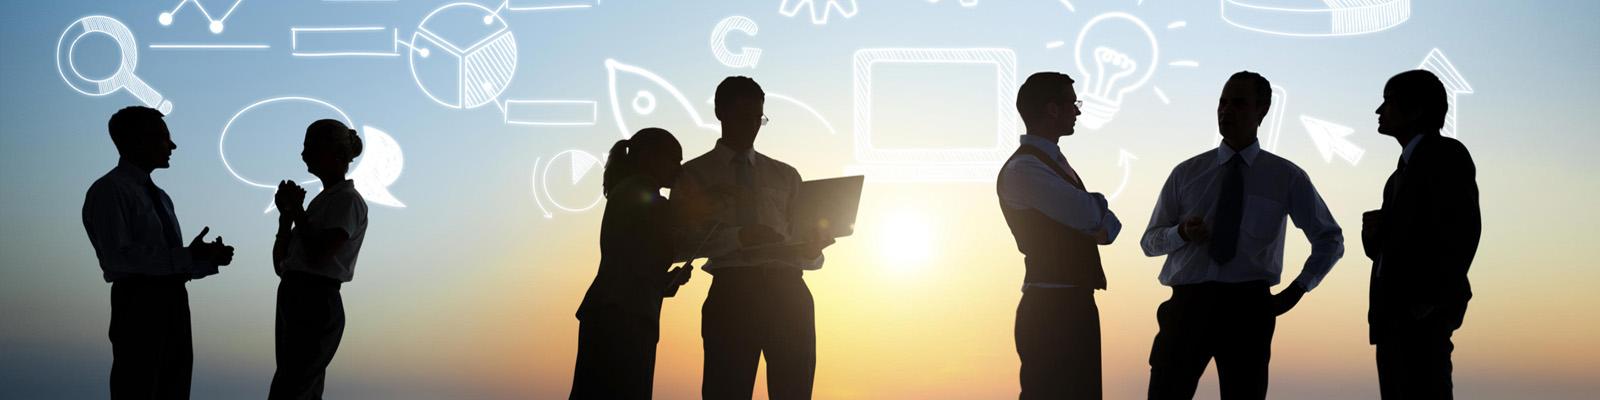 Professionelles Feedback & Dialog für effektive Kooperation fördern